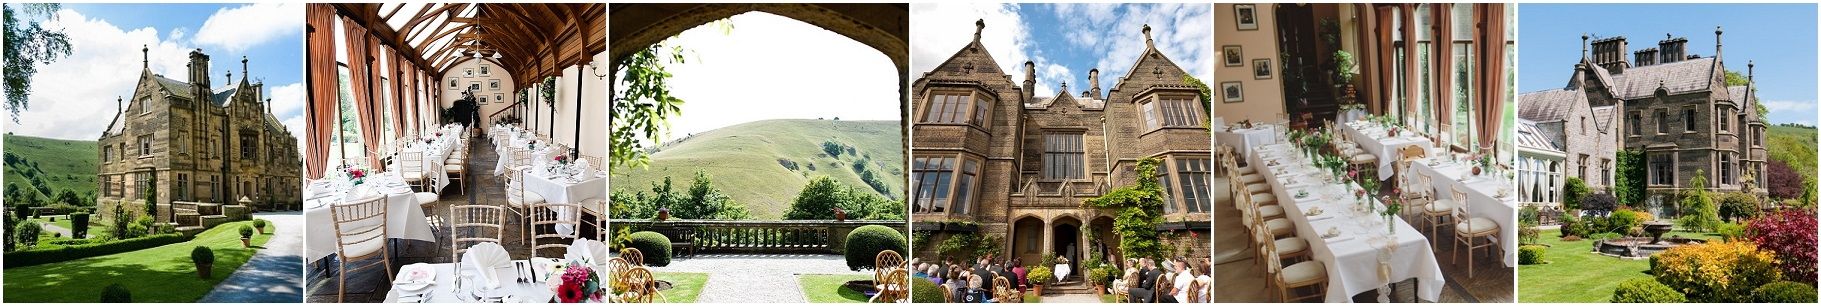 Cressbrook Hall Photos- Derbyshire Wedding Venues